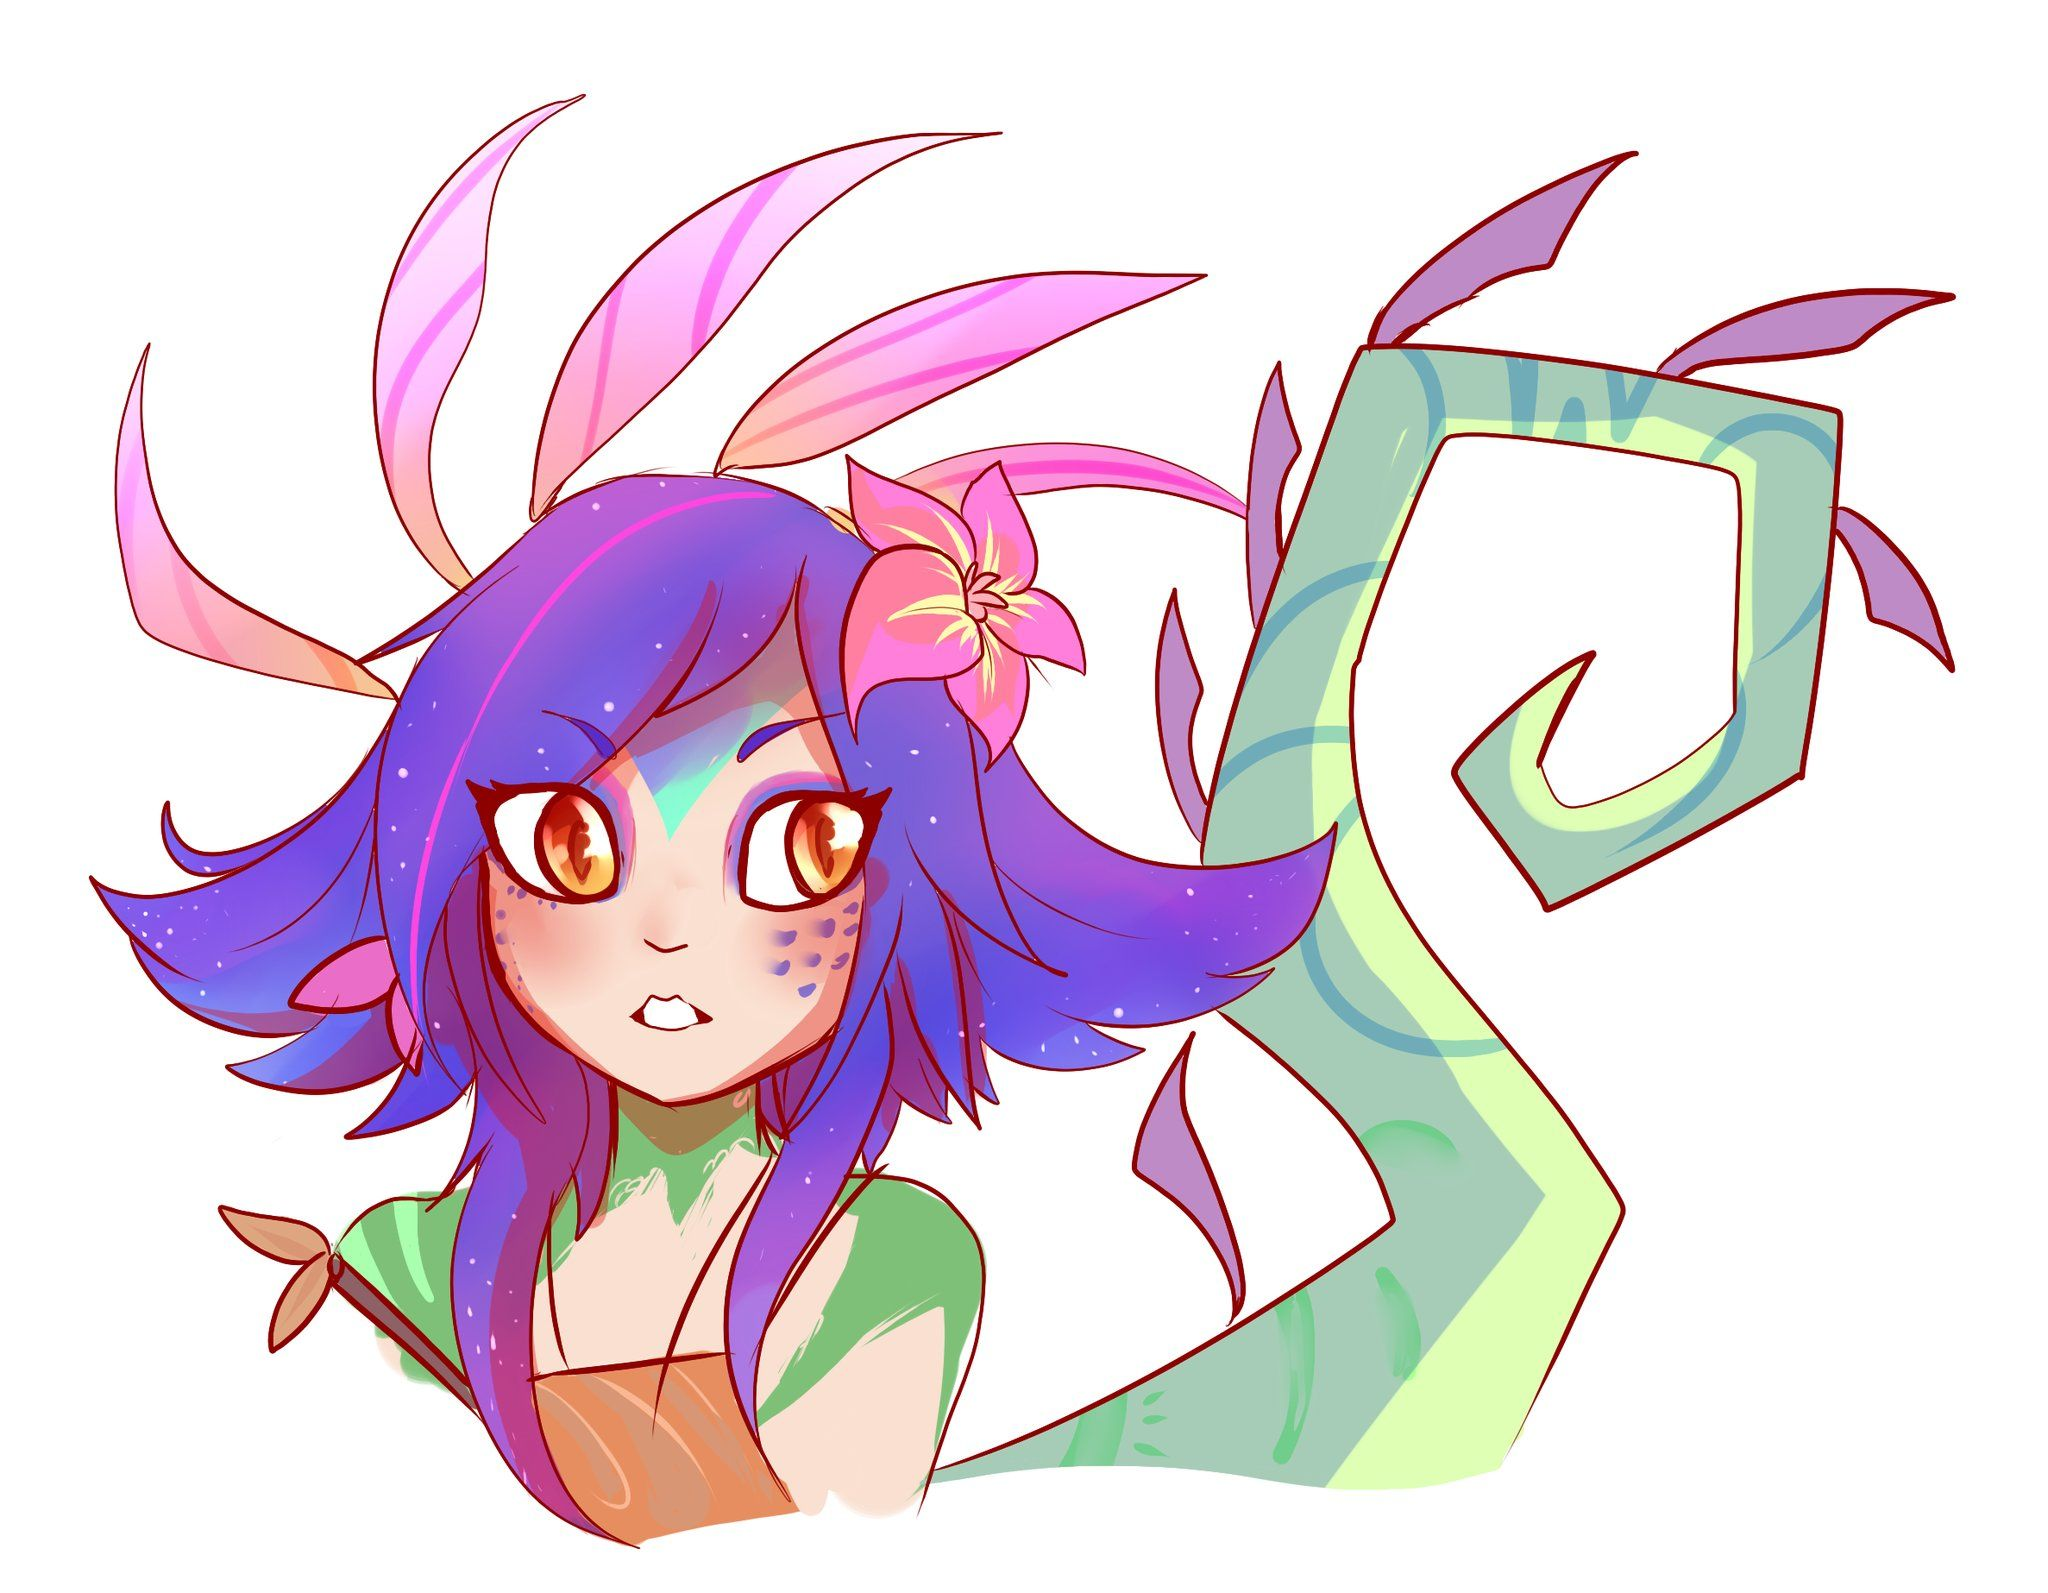 Shenpai Art